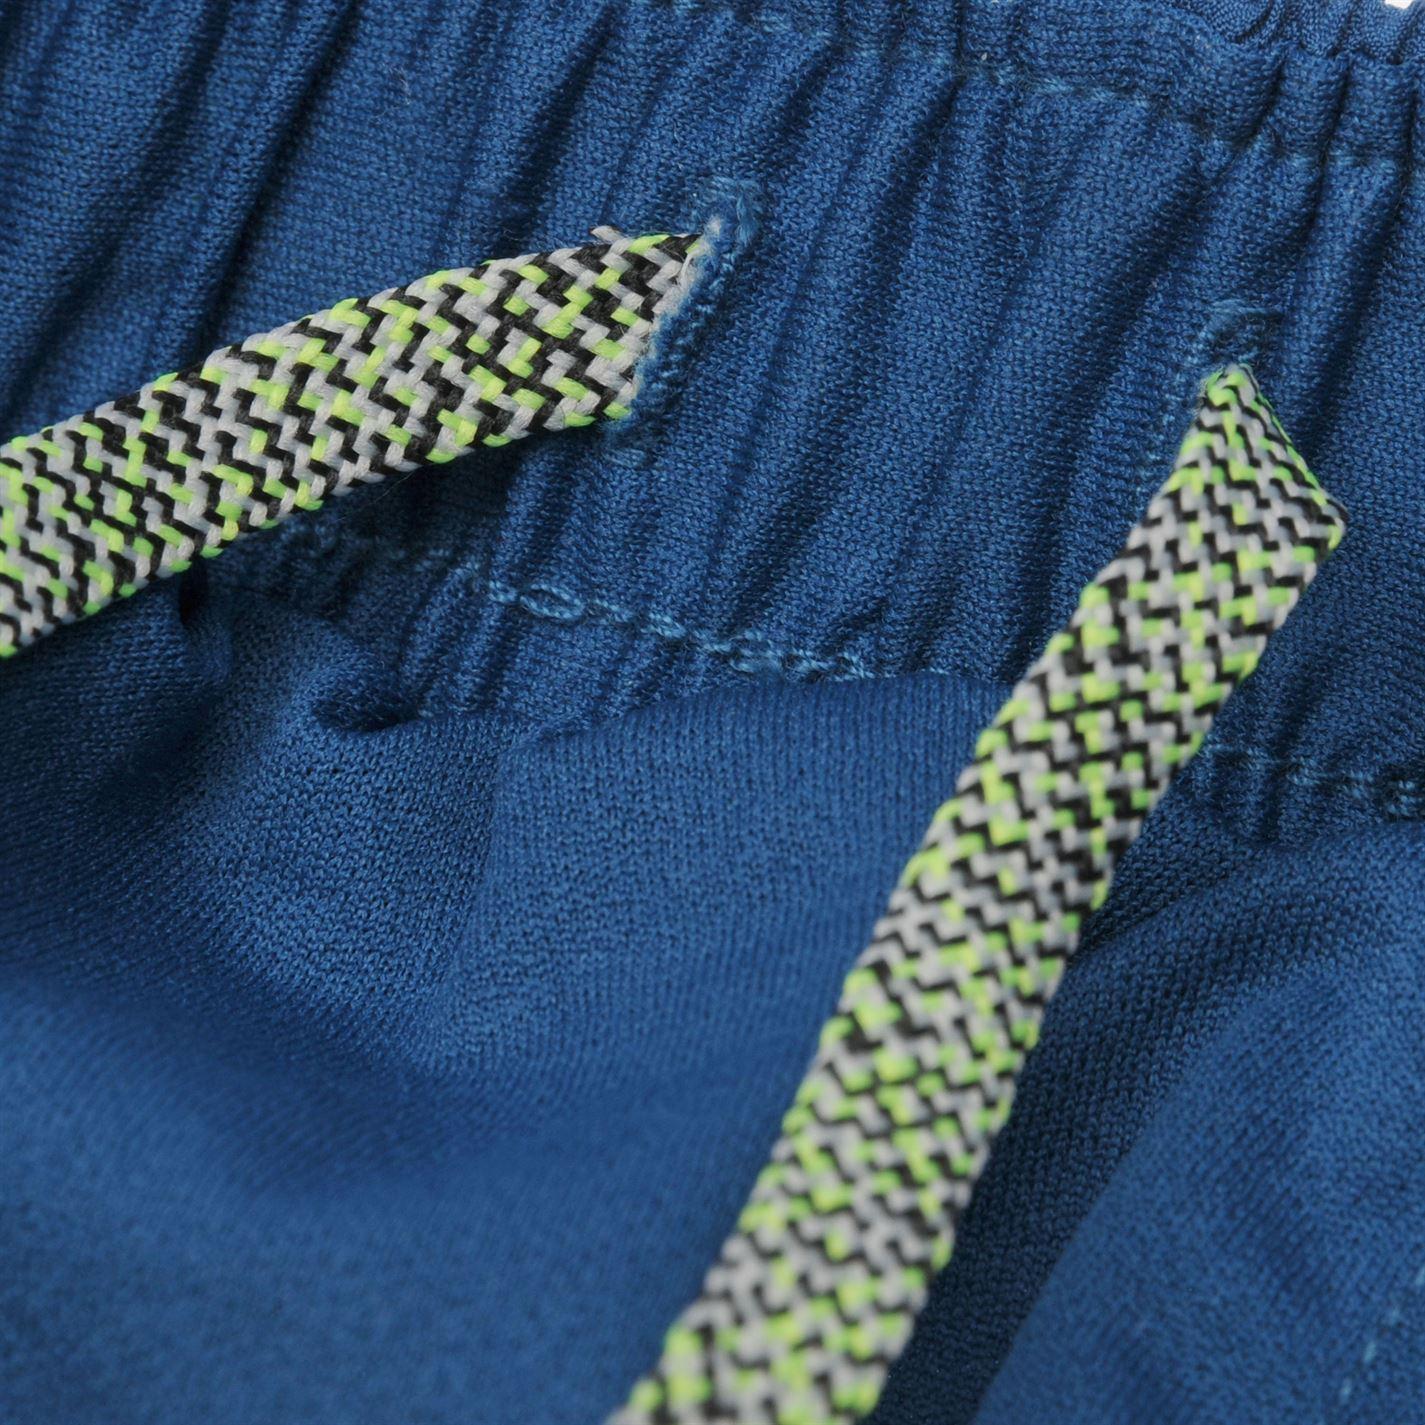 Karrimor-Xlite-5inch-Running-Shorts-Performance-Mens thumbnail 15